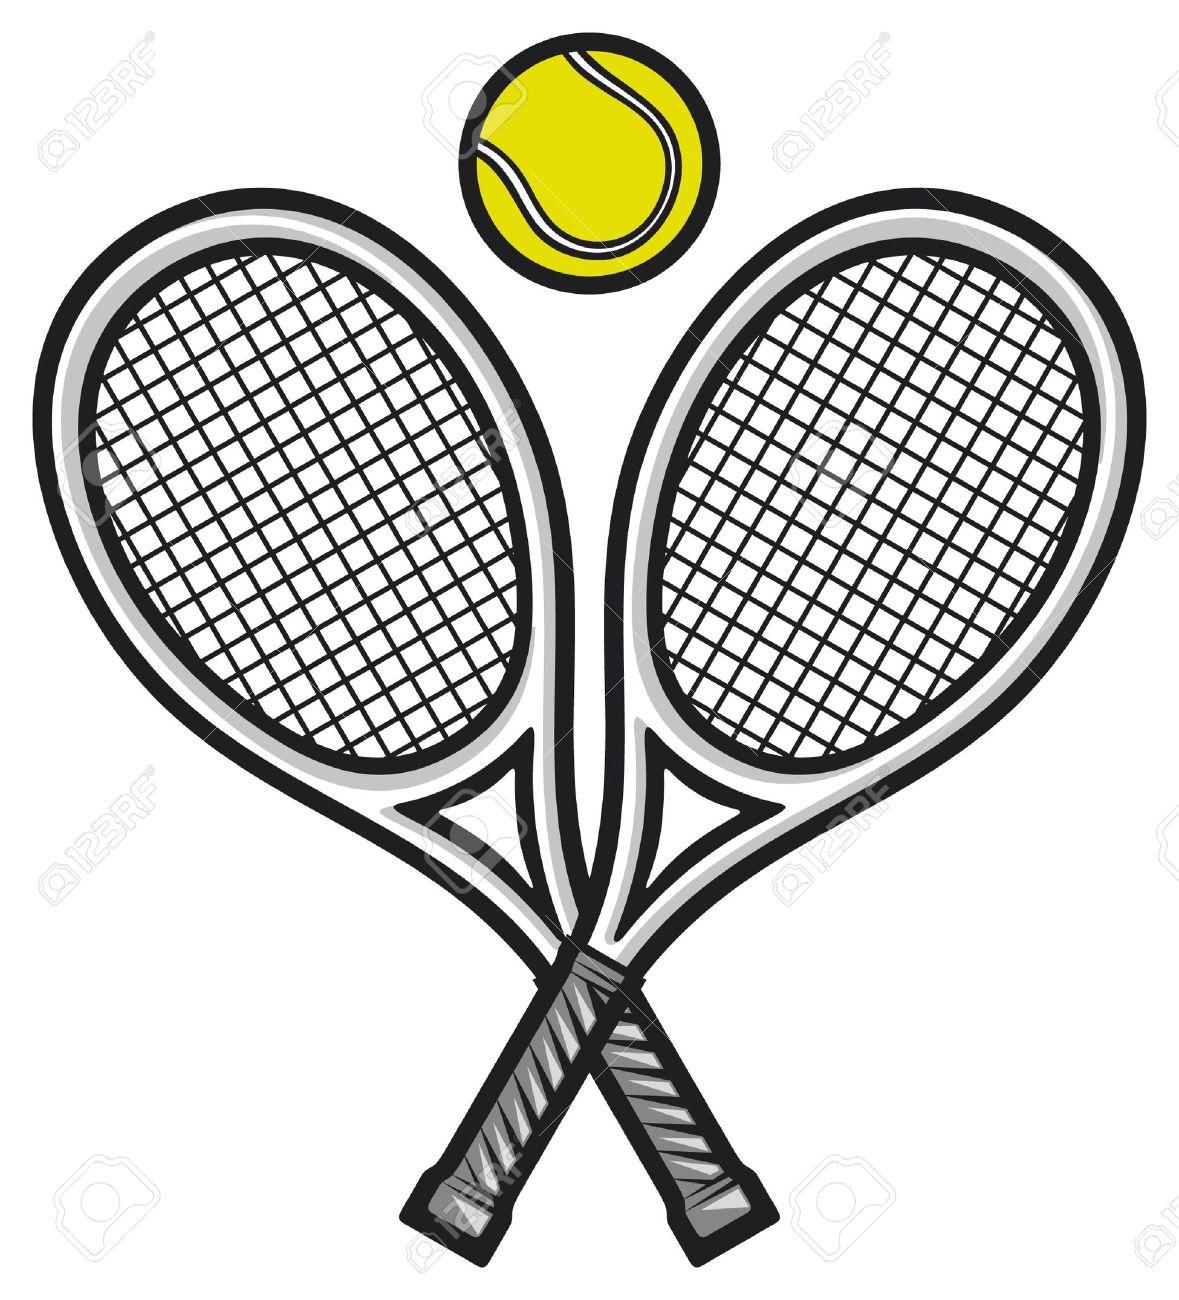 Tennis Rackets And Ball Tennis Design Tennis Symbol Royalty Free